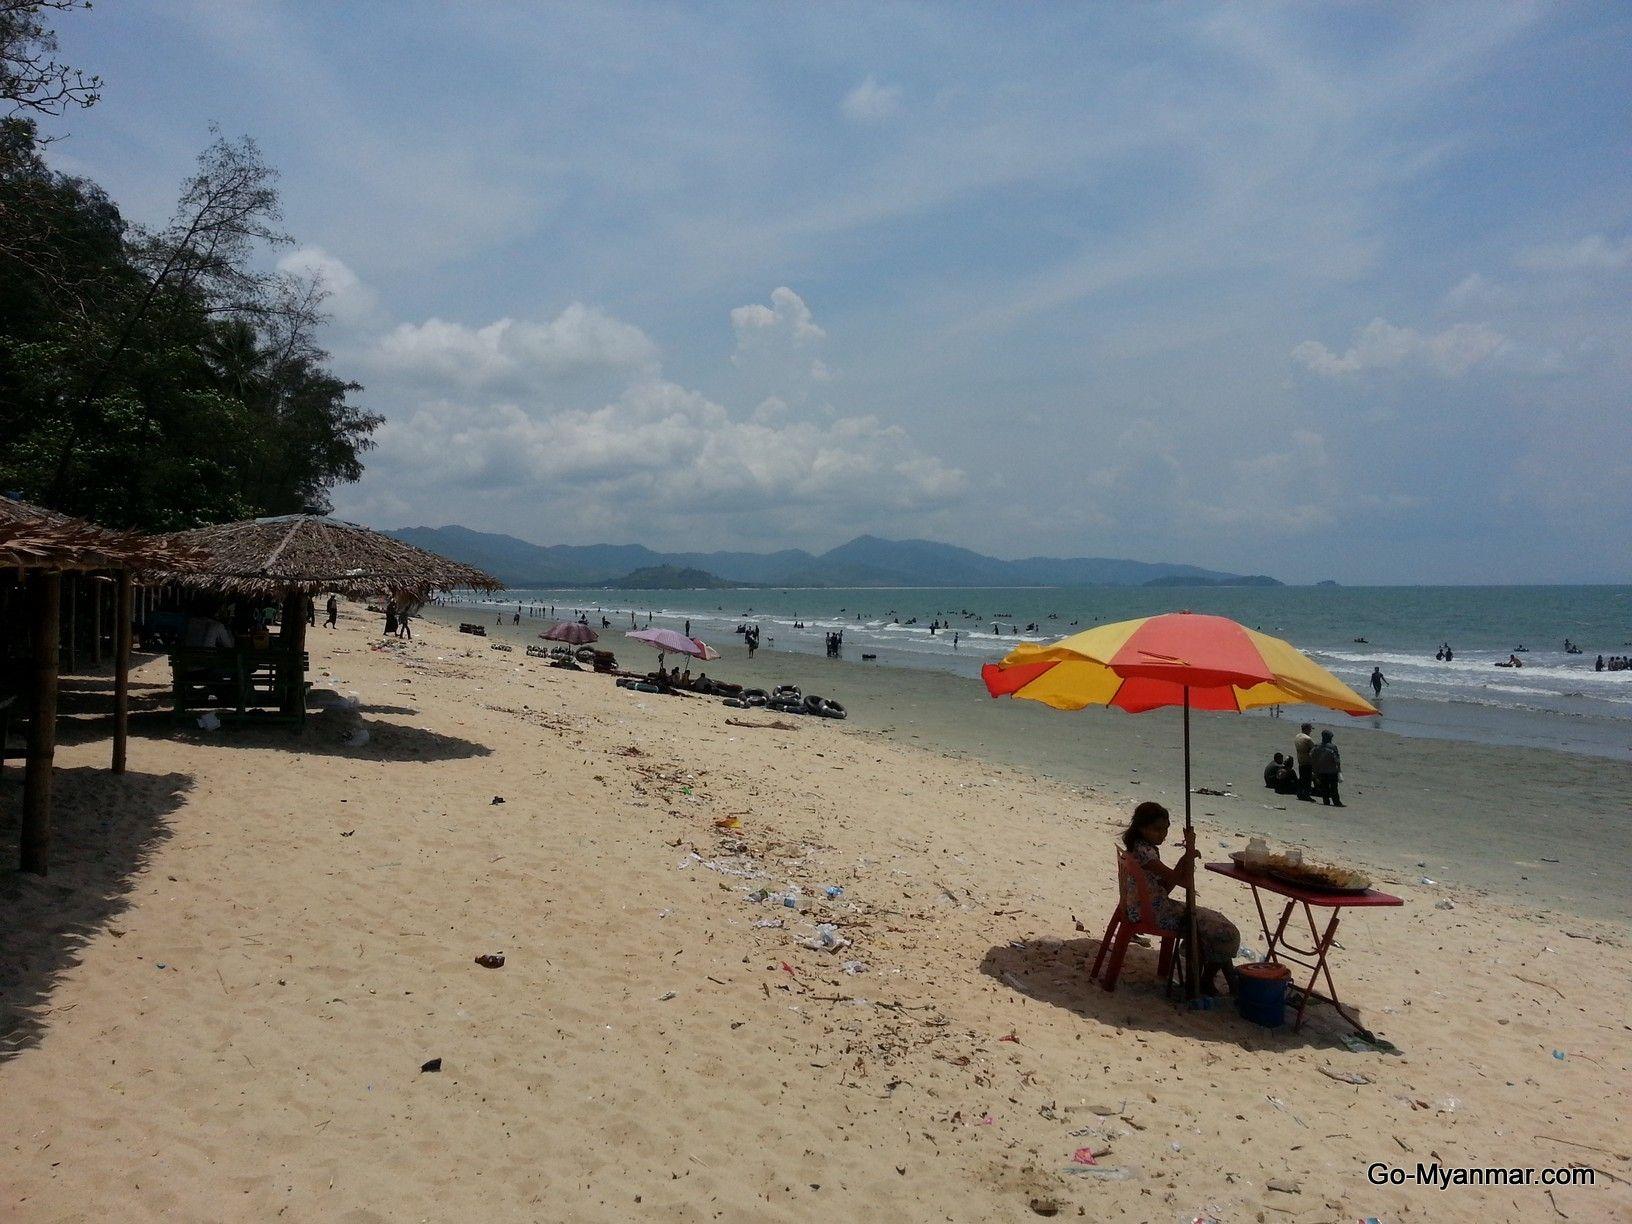 Maungmagan beach near dawei tanintharyi tenasserim division maungmagan beach near dawei tanintharyi tenasserim division myanmar burma thecheapjerseys Images